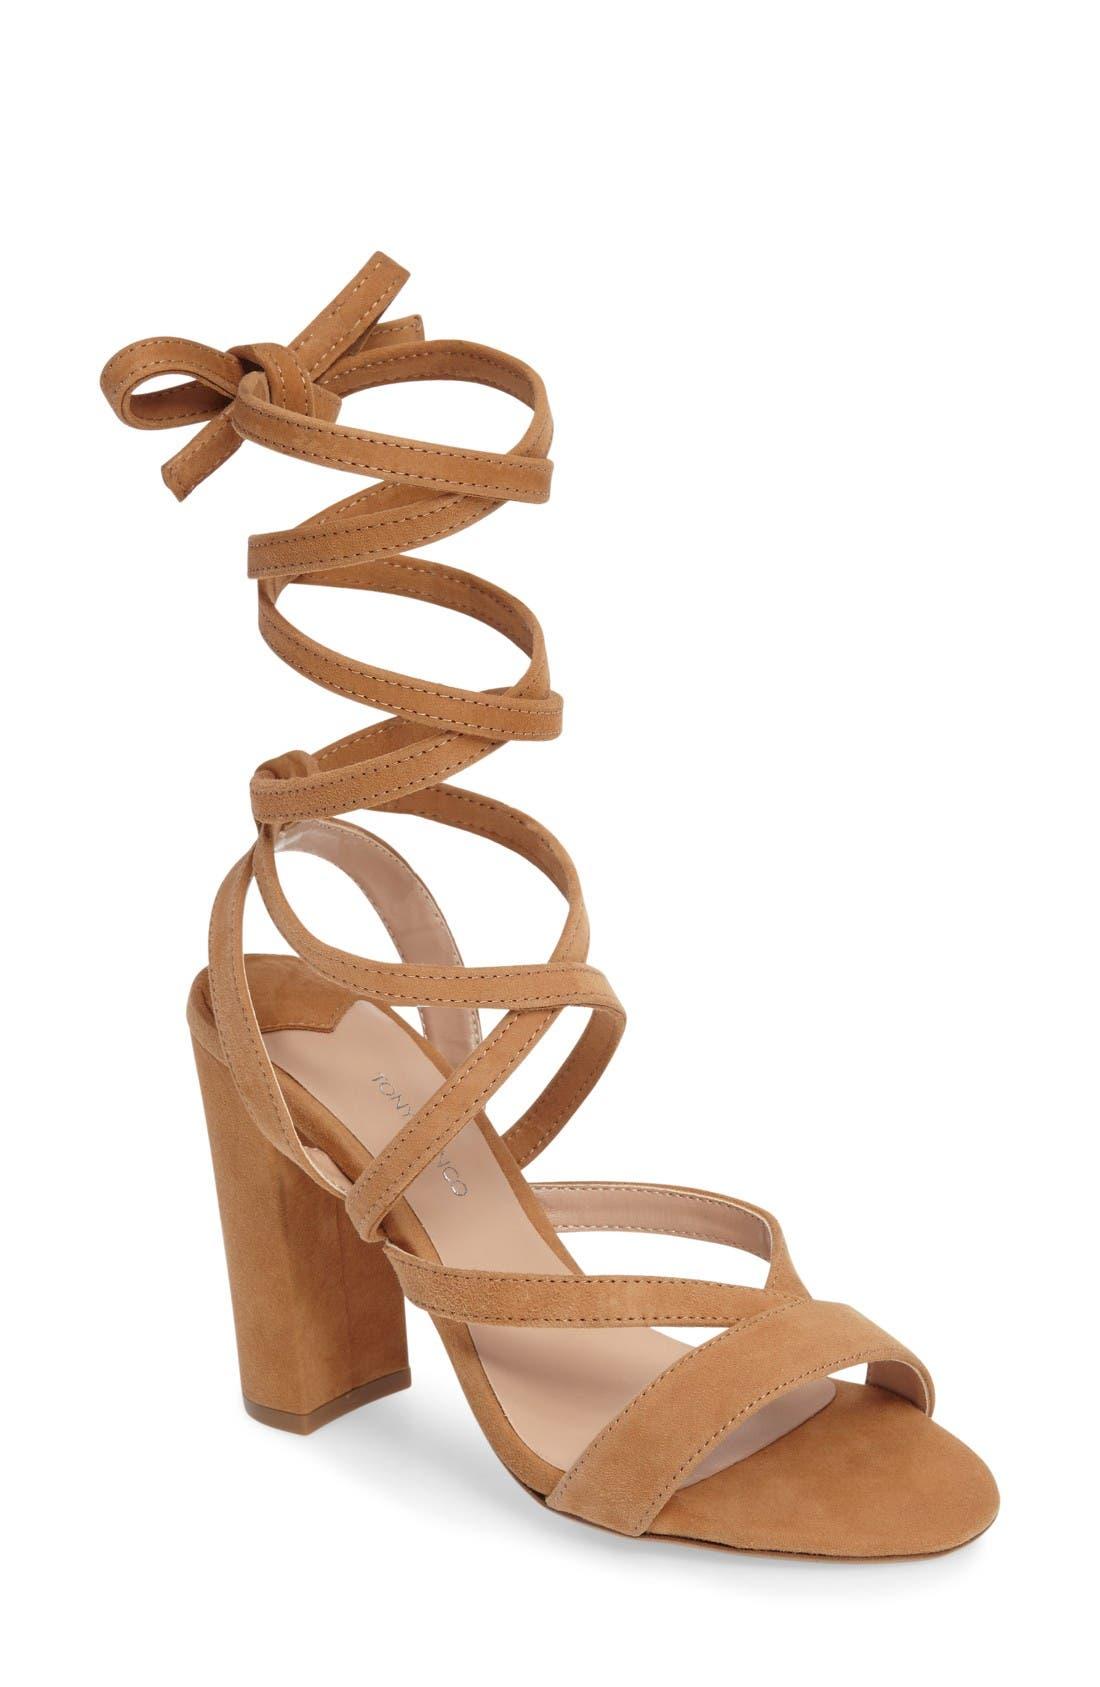 TONY BIANCO Kappa Ankle Wrap Sandal